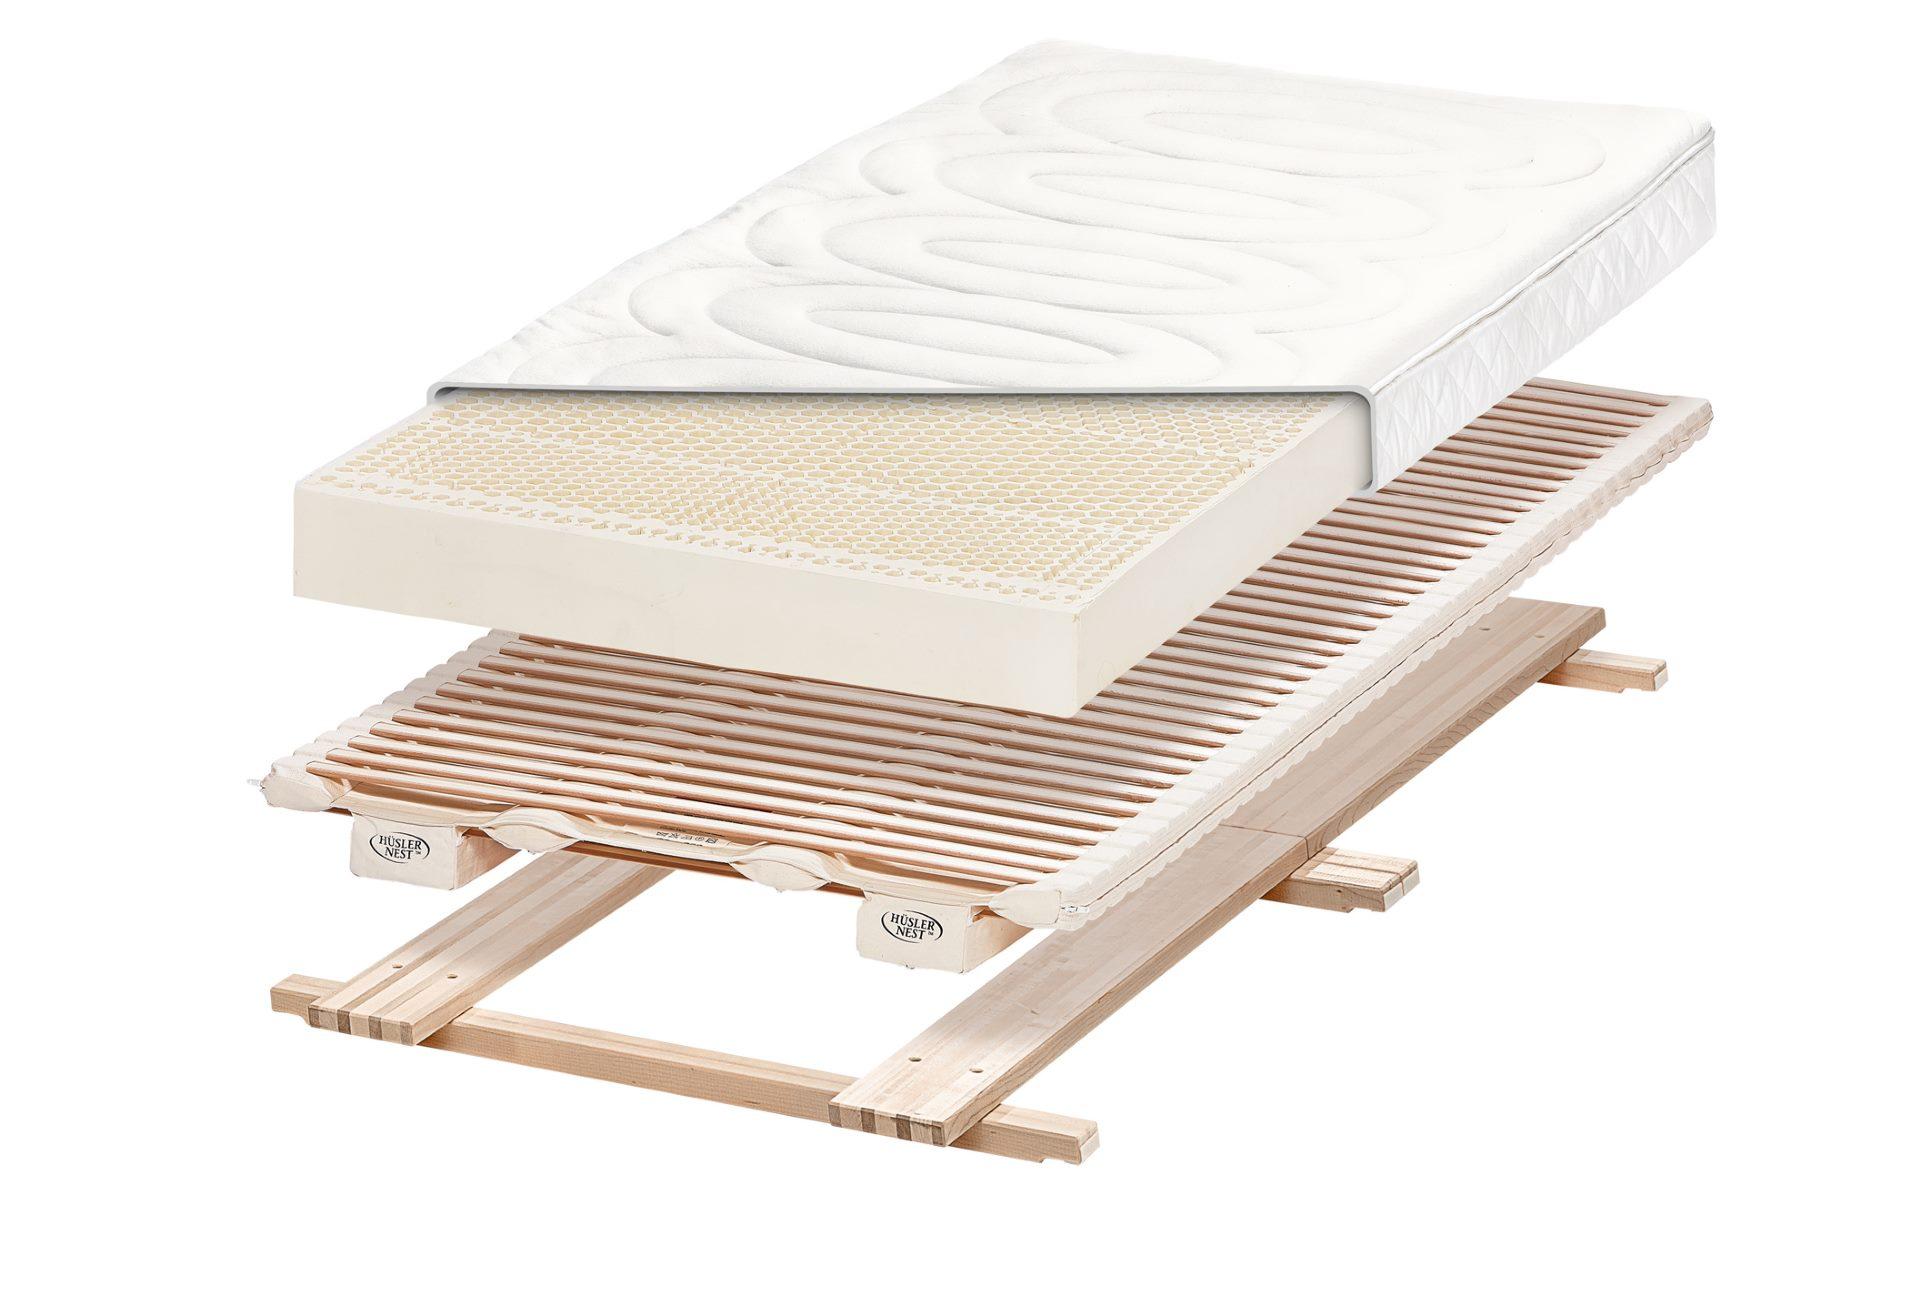 liegesystem h sler nest deluxe wohnopposition berlin. Black Bedroom Furniture Sets. Home Design Ideas